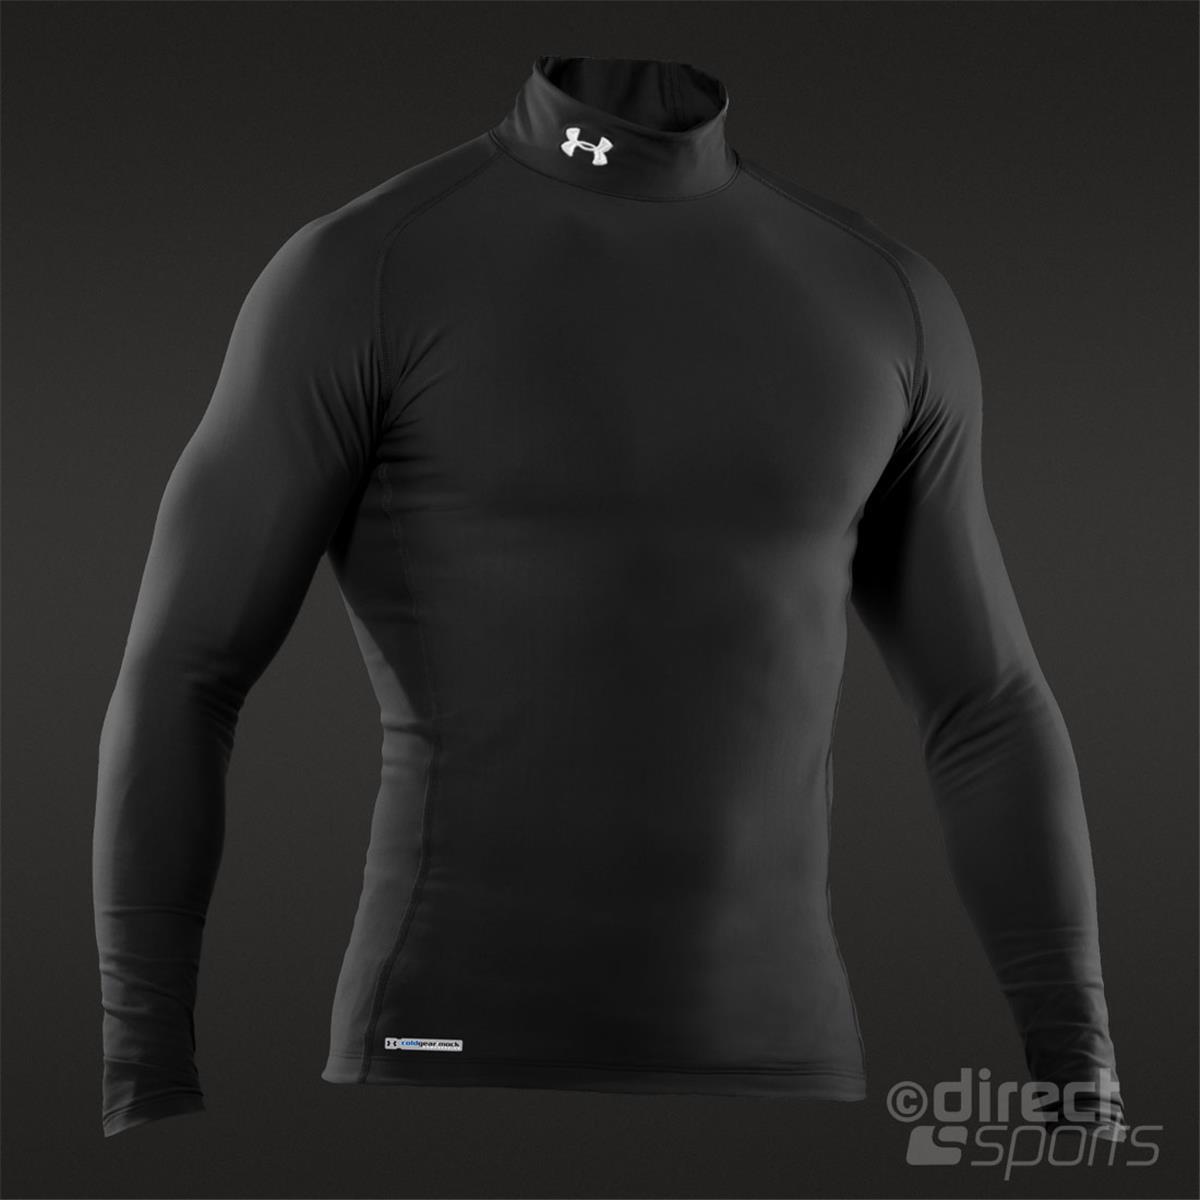 Under Armour Cold Gear Evo Compression Mens Mock Top (Black)